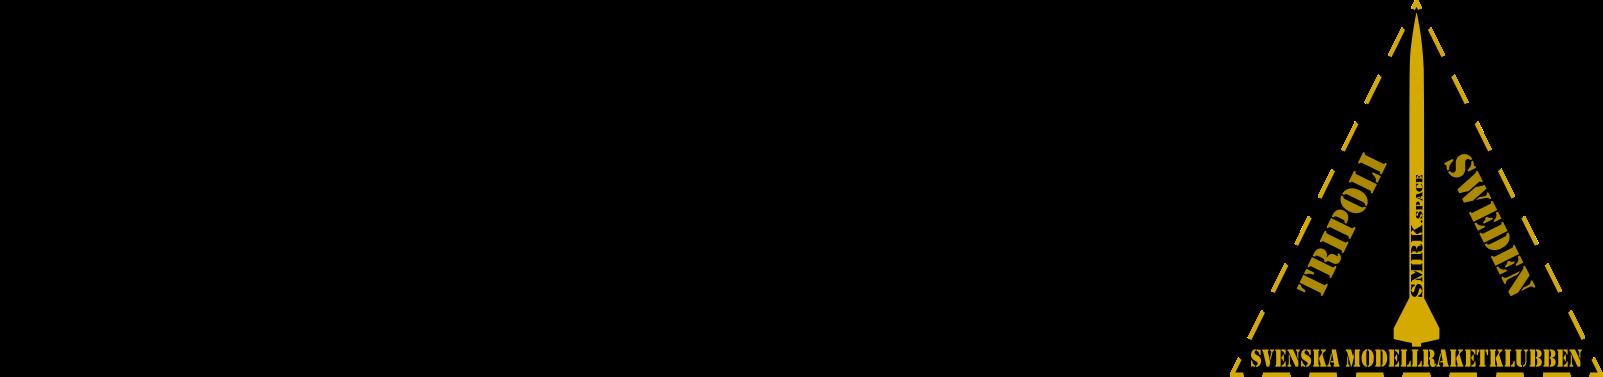 Svenska Modellraketklubben